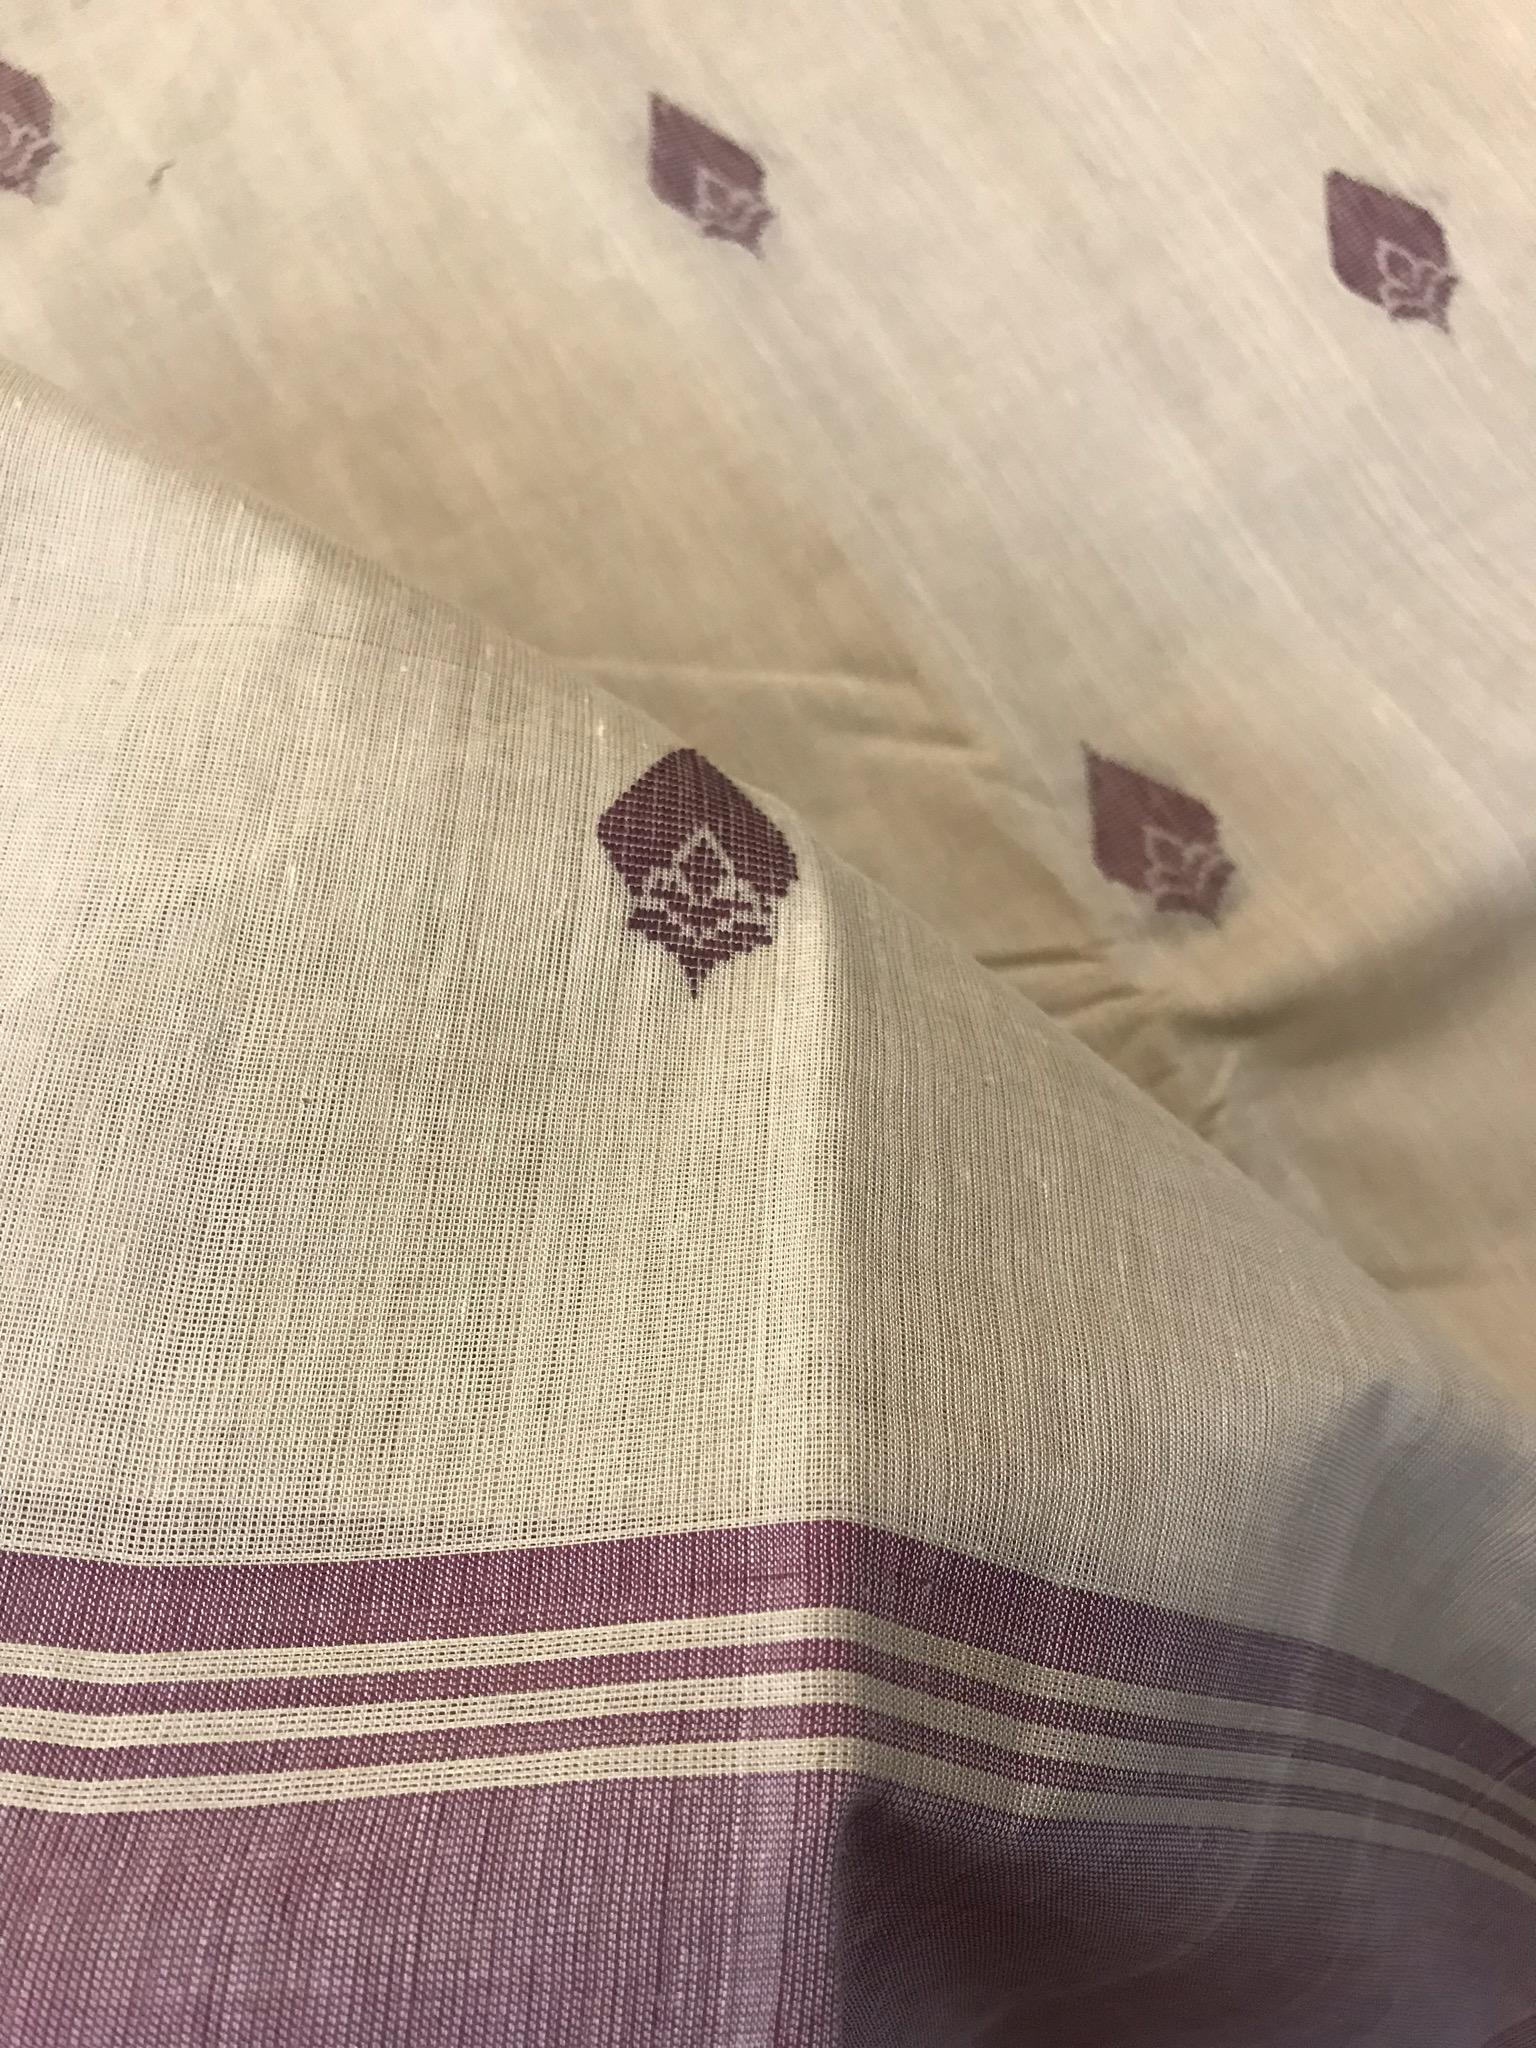 Cream and Maroon Kanchi Cotton Saree (INDI-1028)